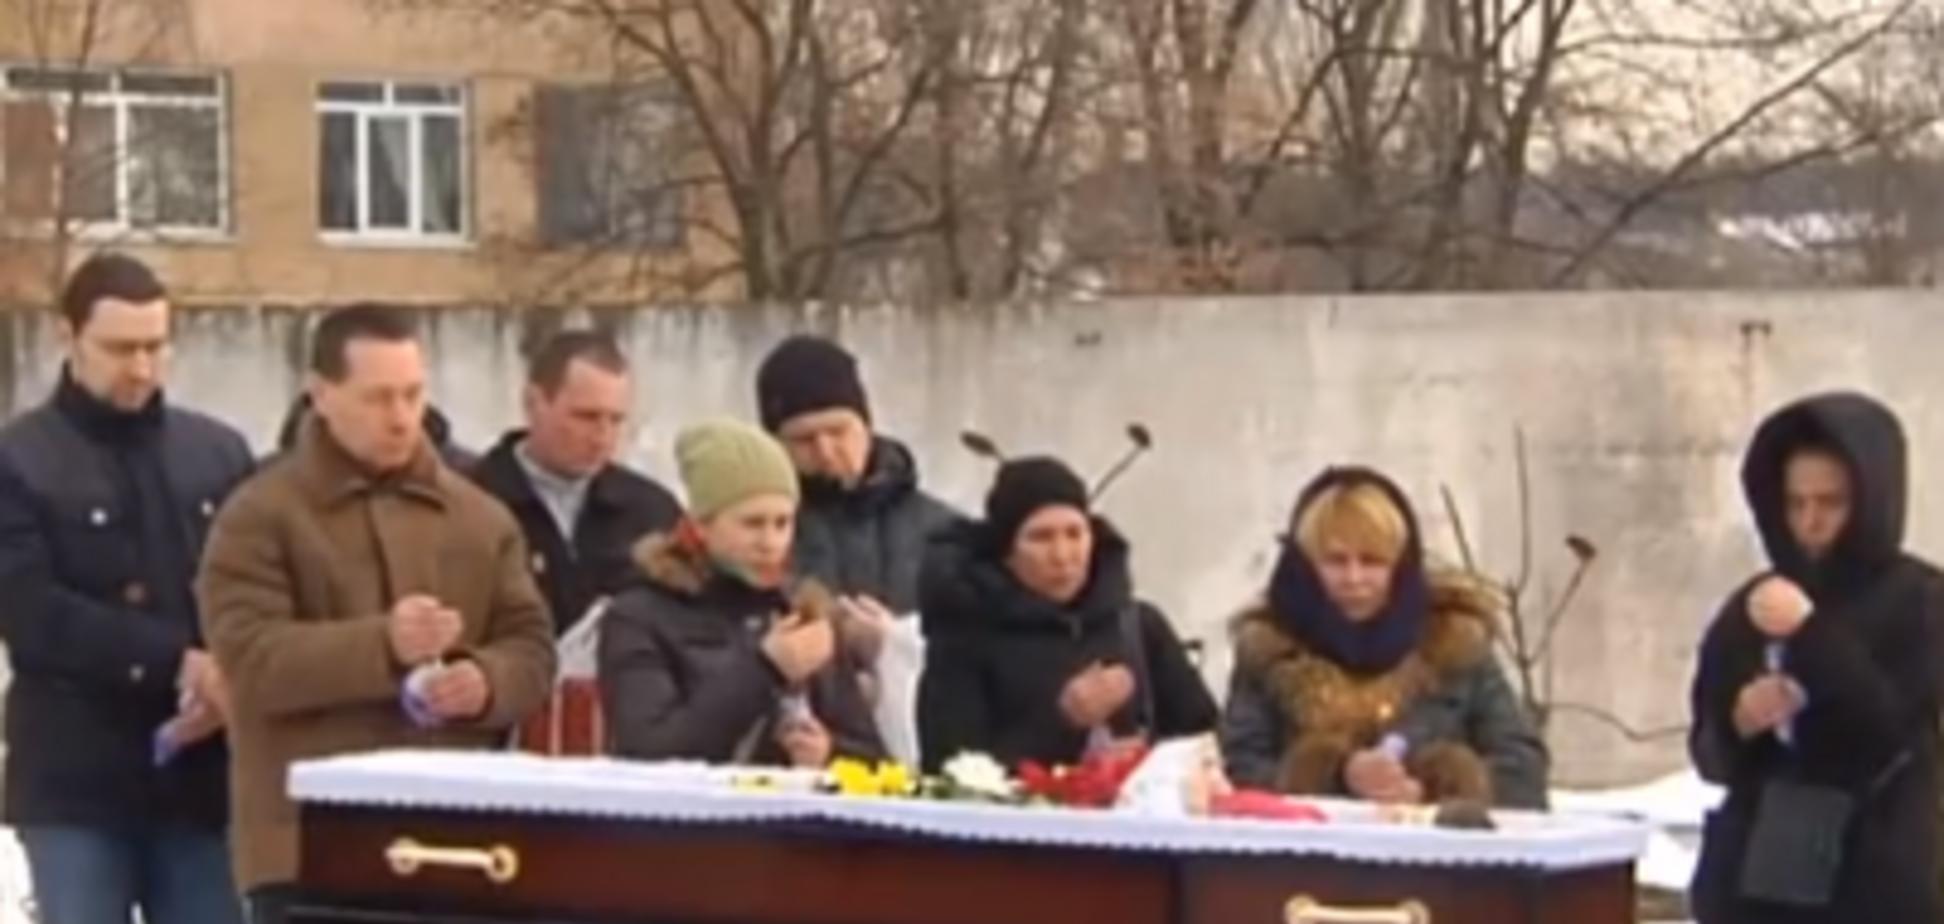 'Усе обличчя синє': смерть жінки у пологовому будинку Києва викликала скандал